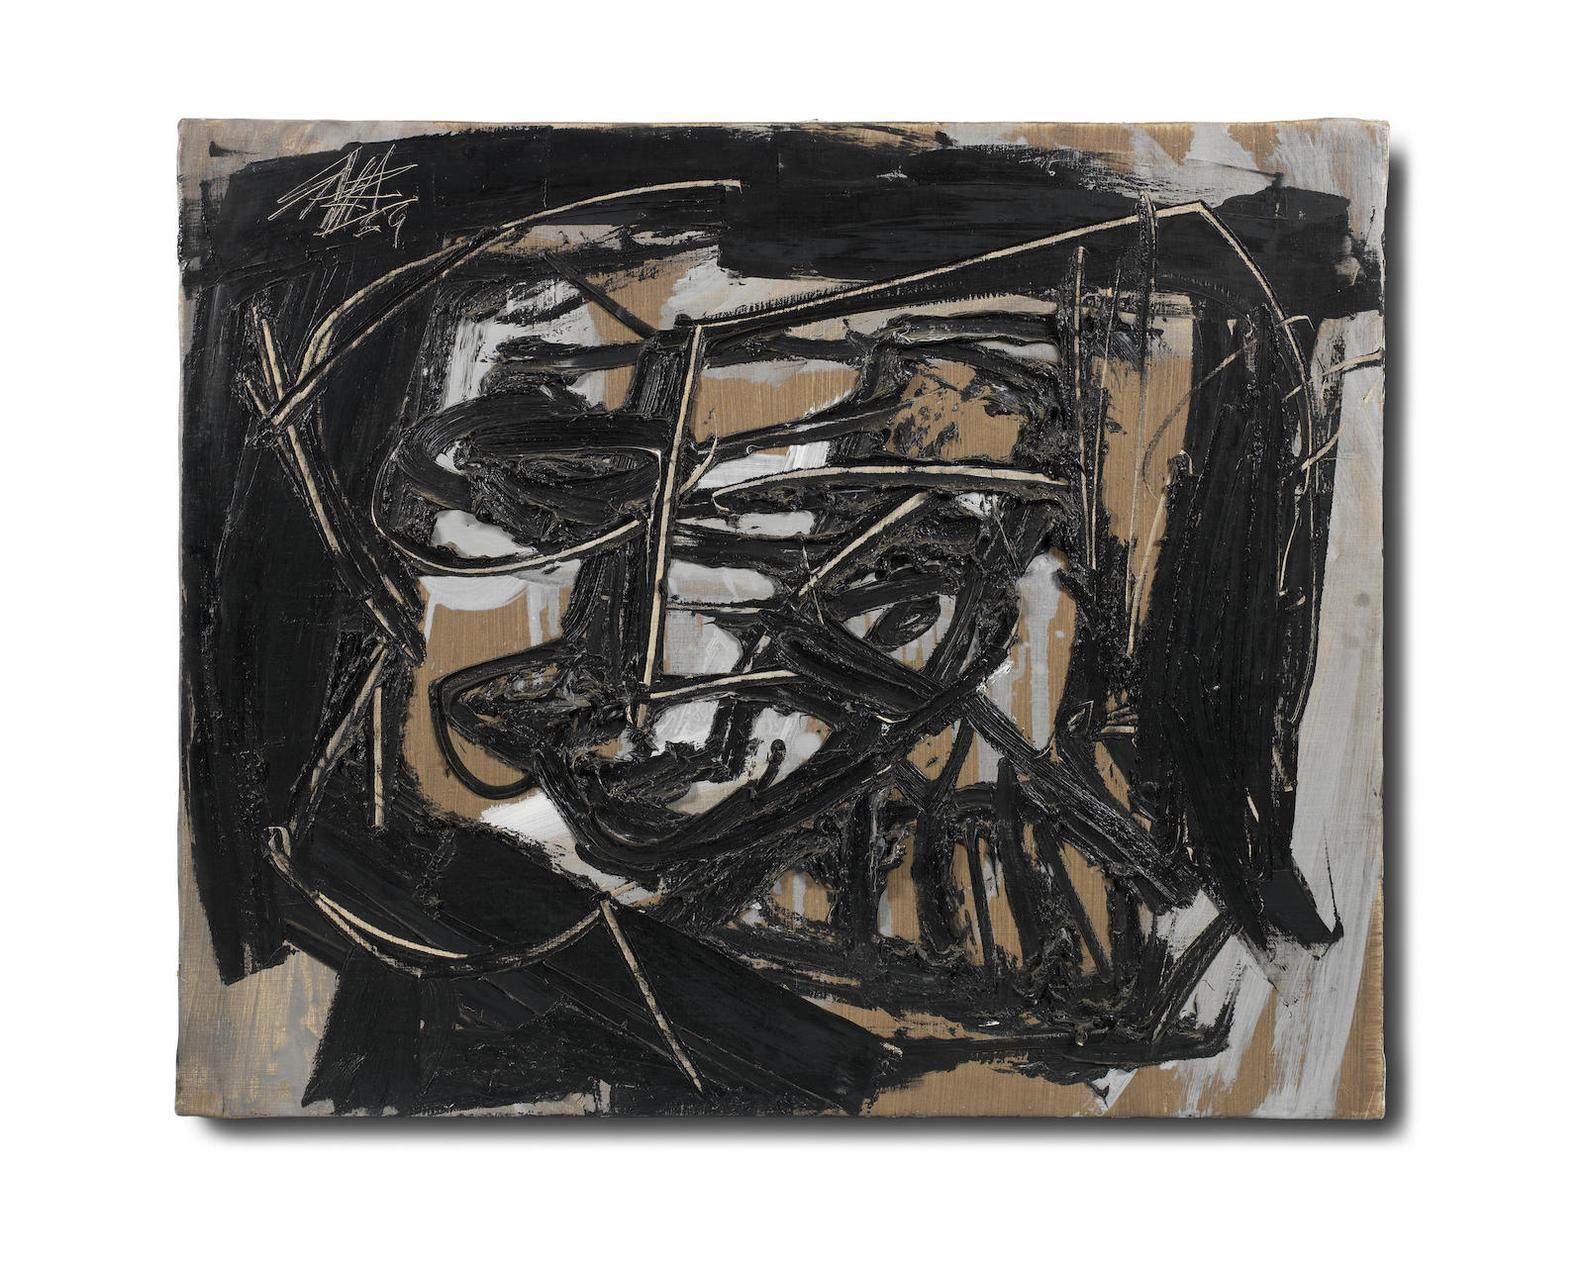 Antonio Saura-Retrato No. 68/Autoportrait-1959